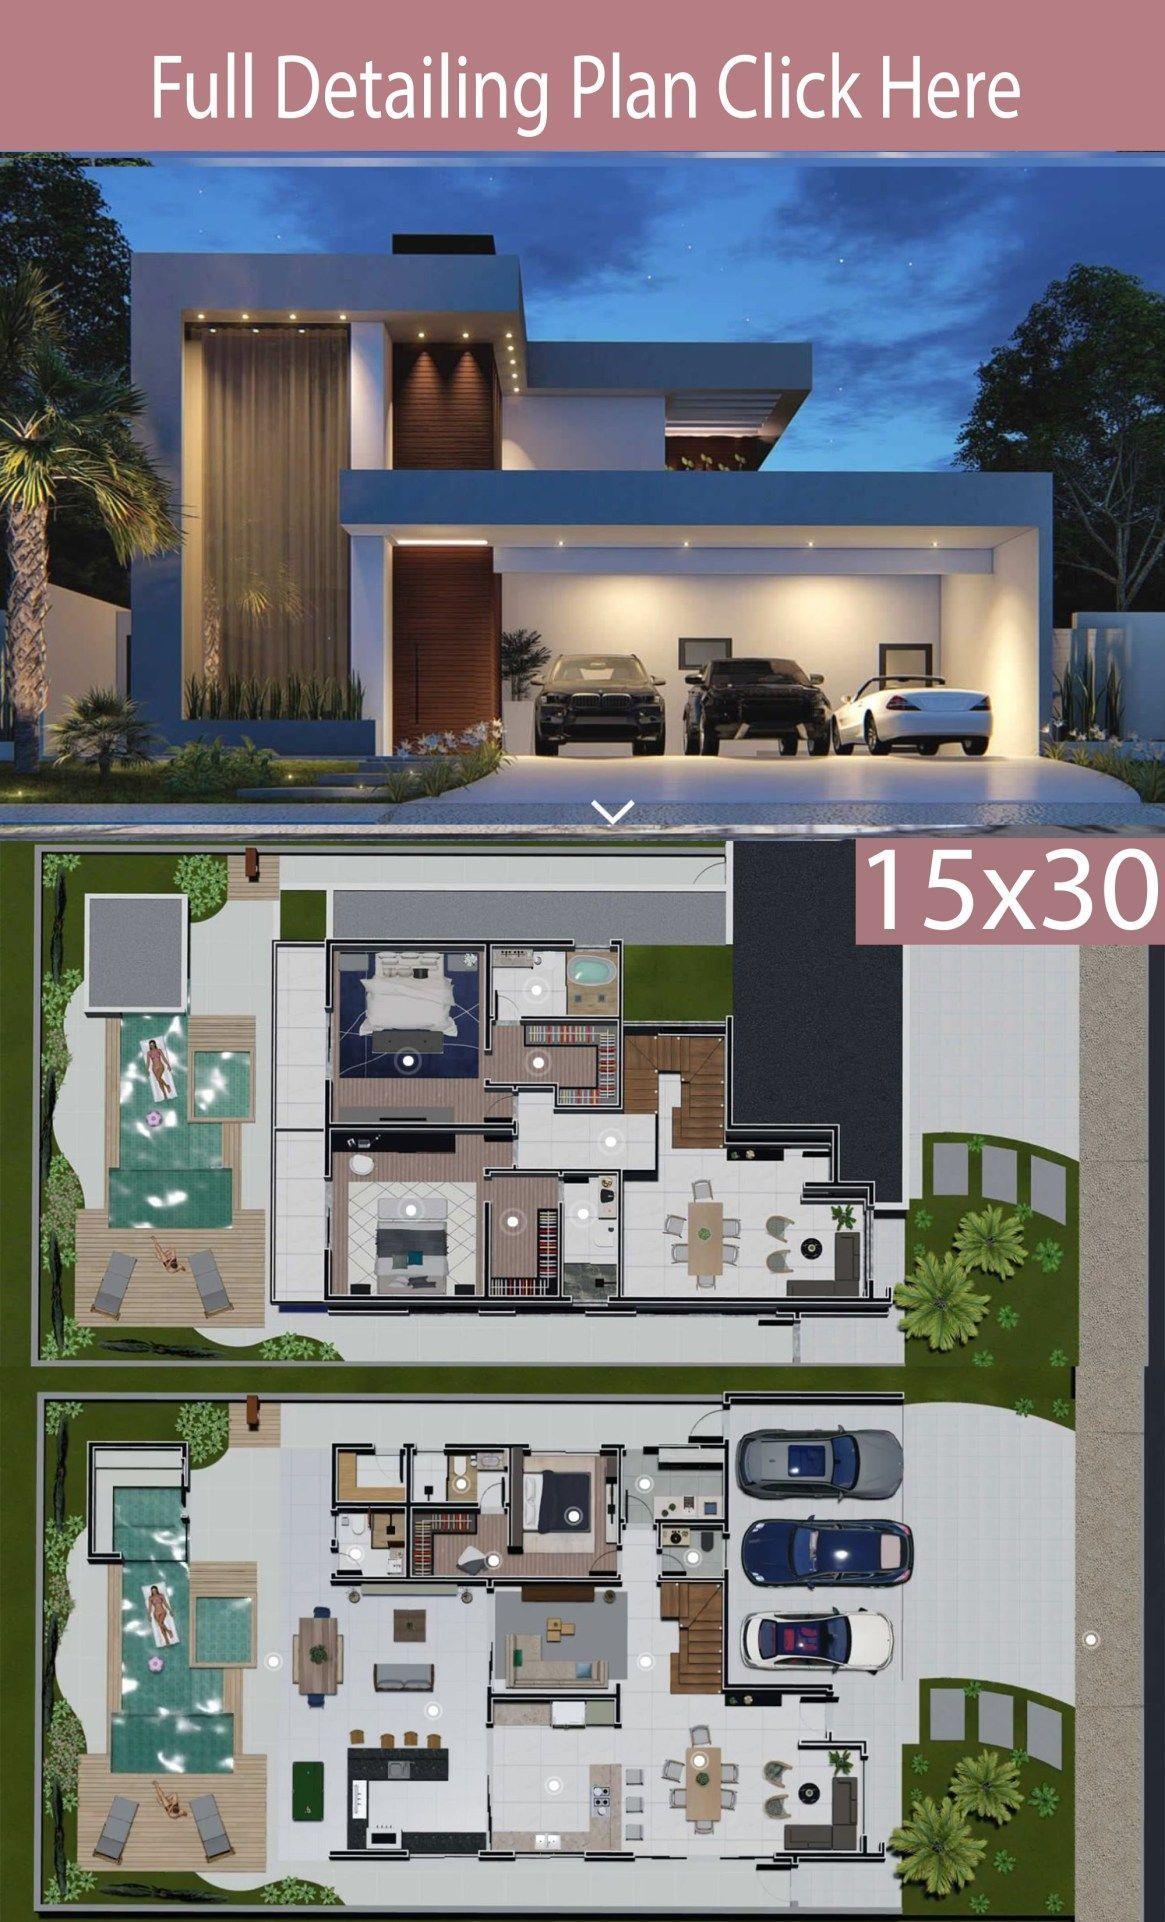 23 Best Decor Ideas 2020 Best Decor Idea Ideas Decorideas Home Homedecor A In 2020 Home Design Floor Plans Modern House Floor Plans Architectural House Plans